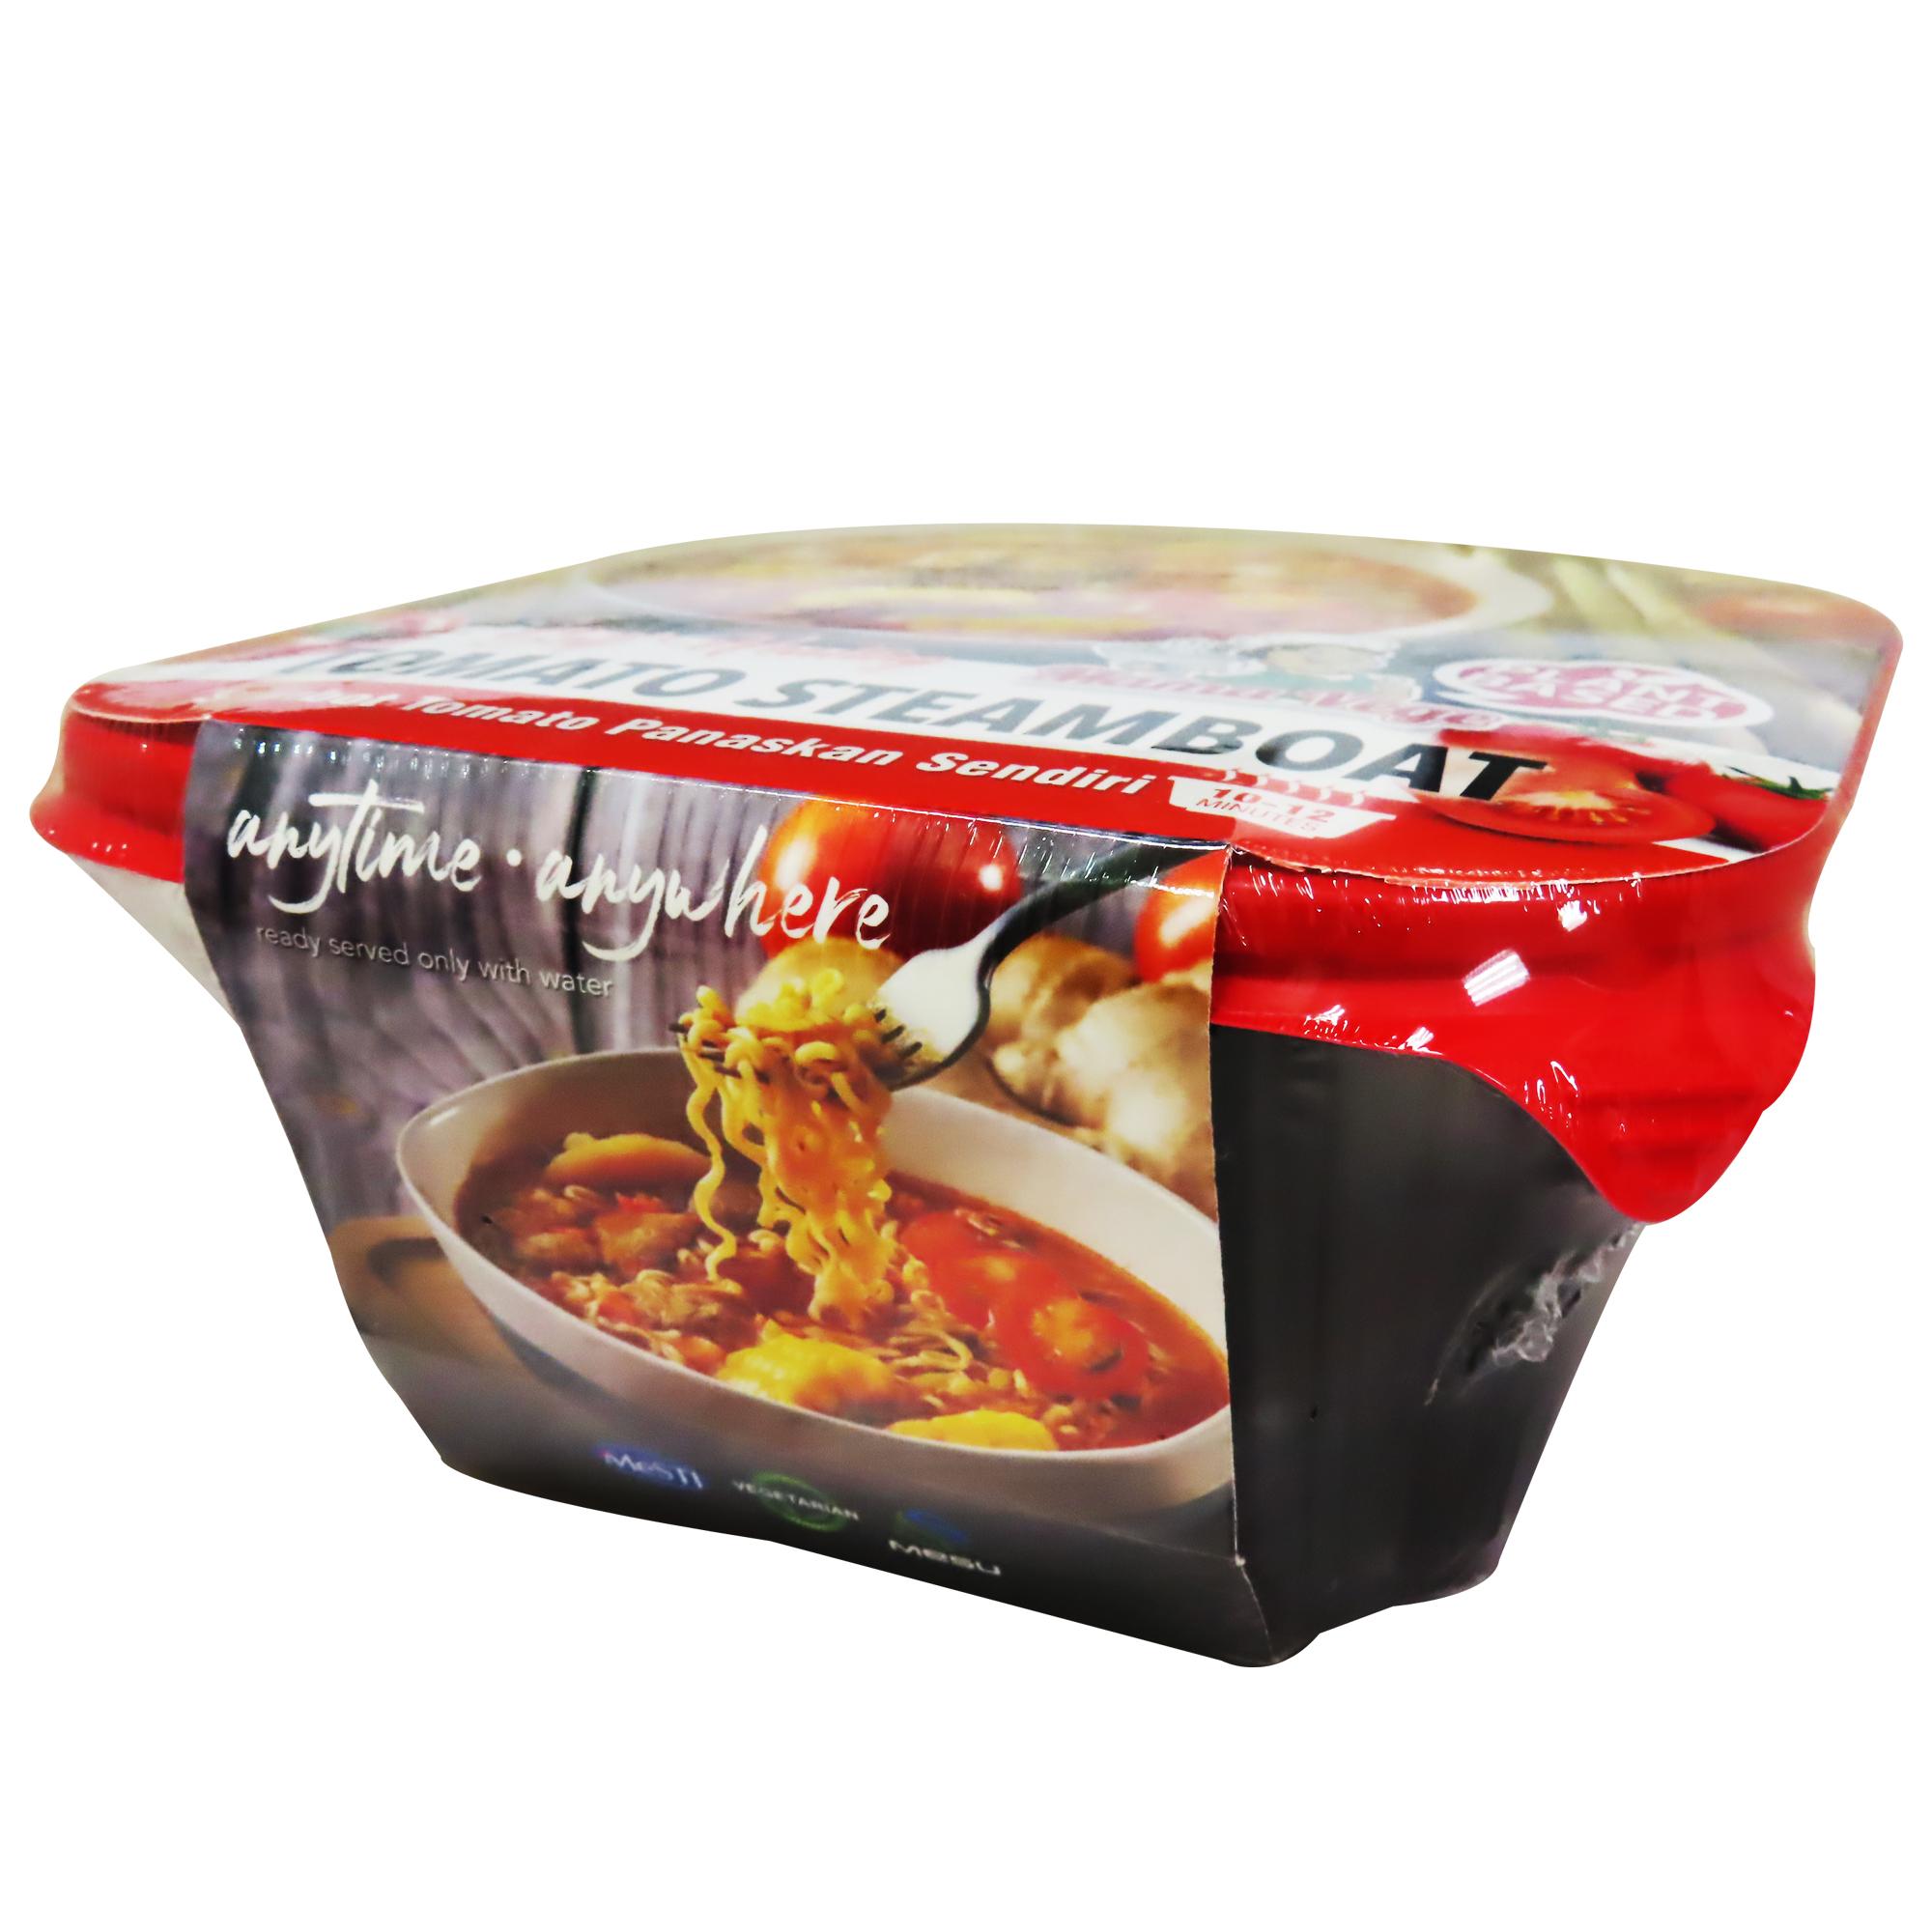 Image Tomato steamboat 懒人番茄火锅 340grams